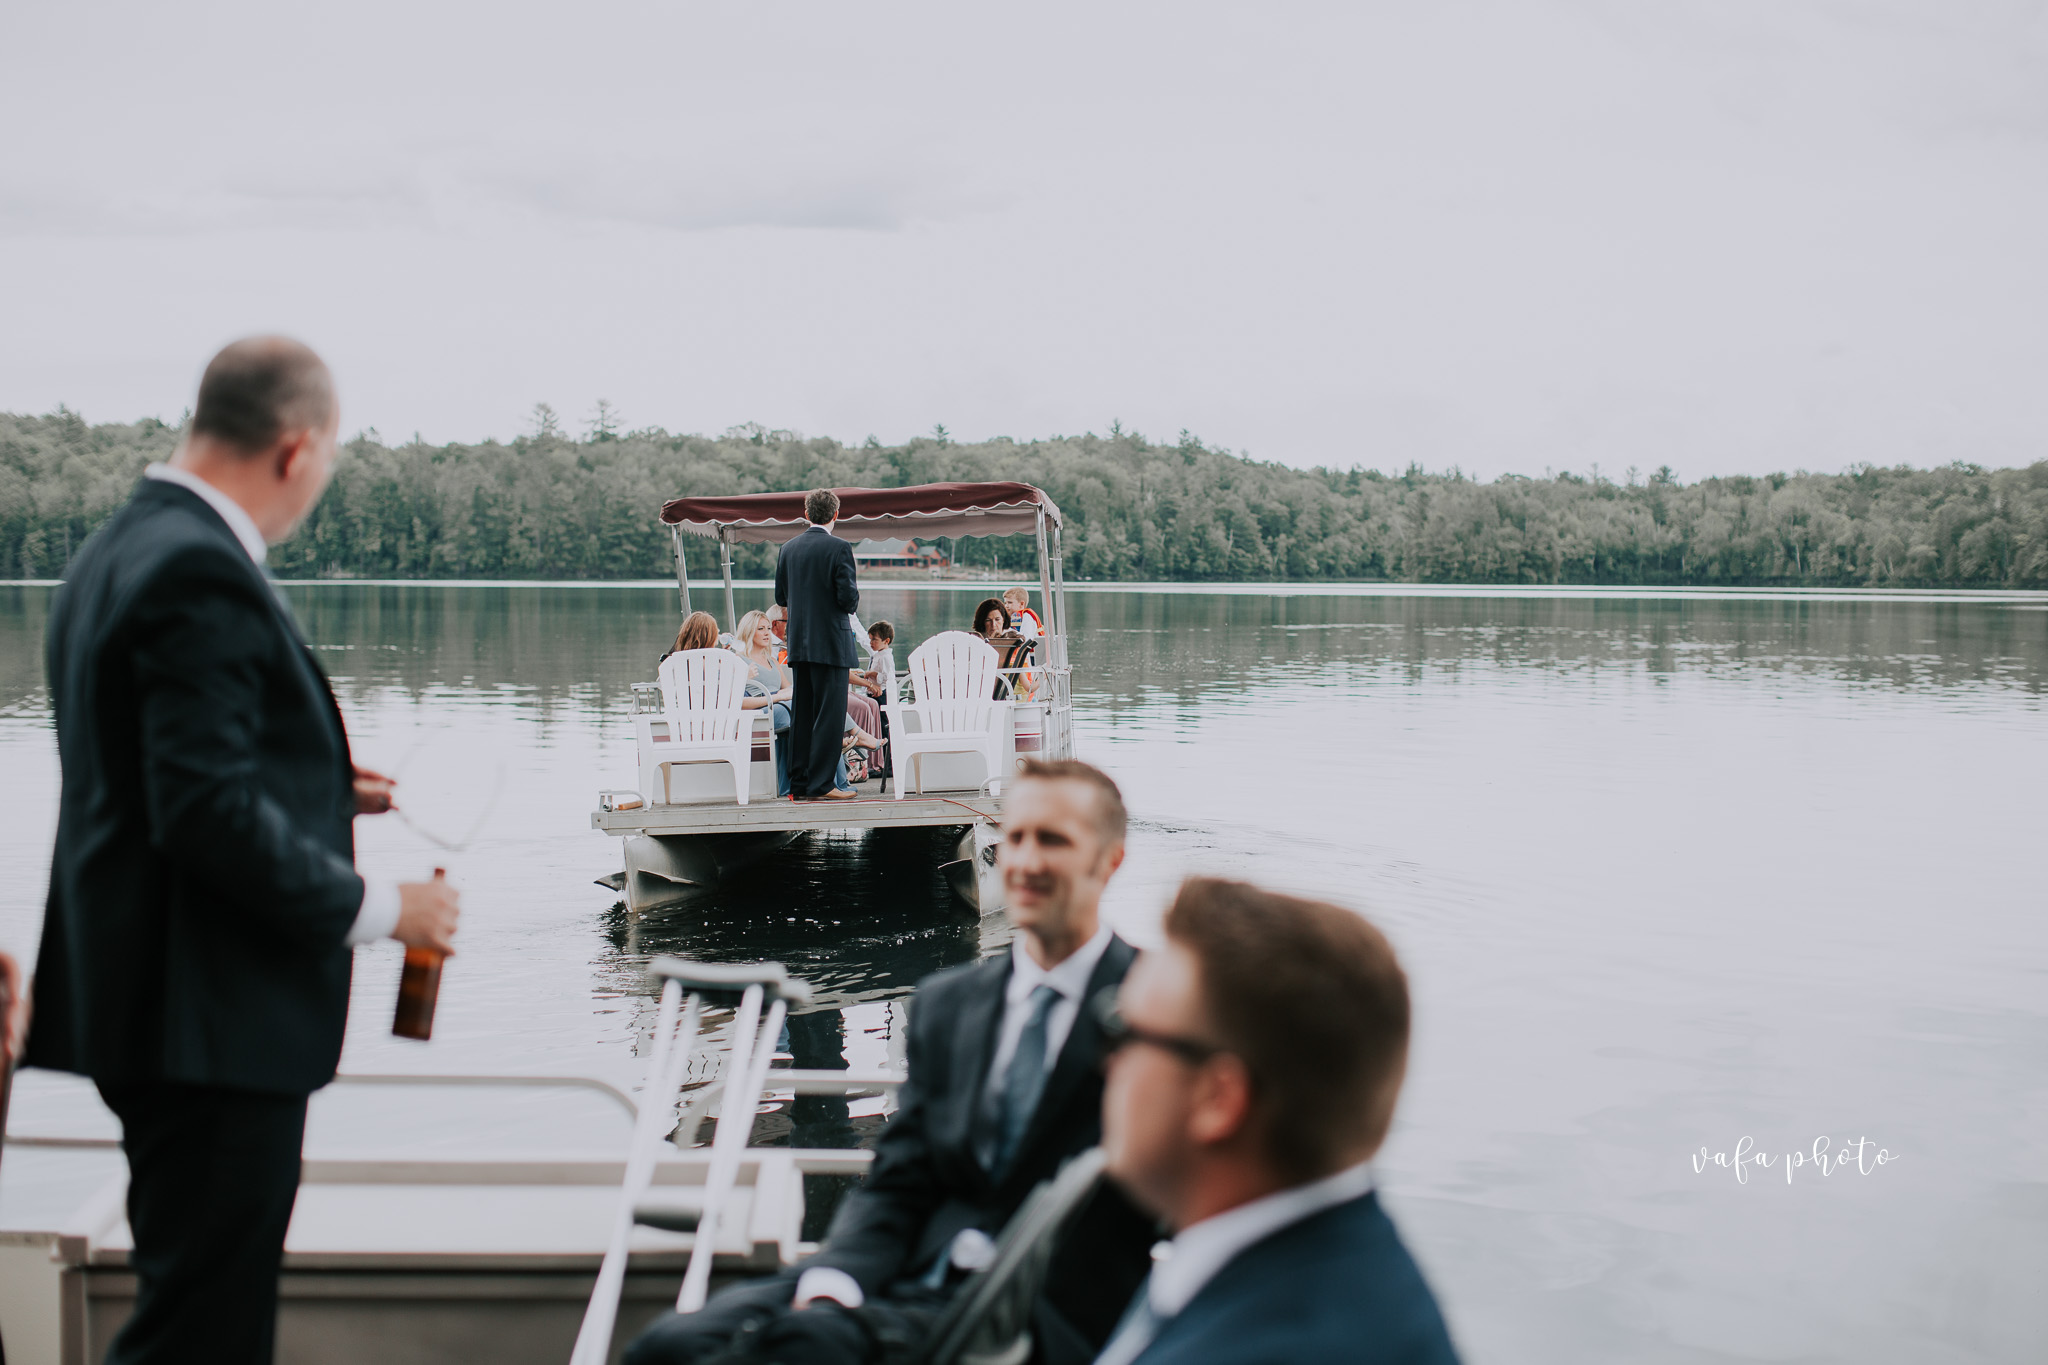 Michigan-Lake-House-Wedding-Madeline-Patrick-Vafa-Photo-174.jpg